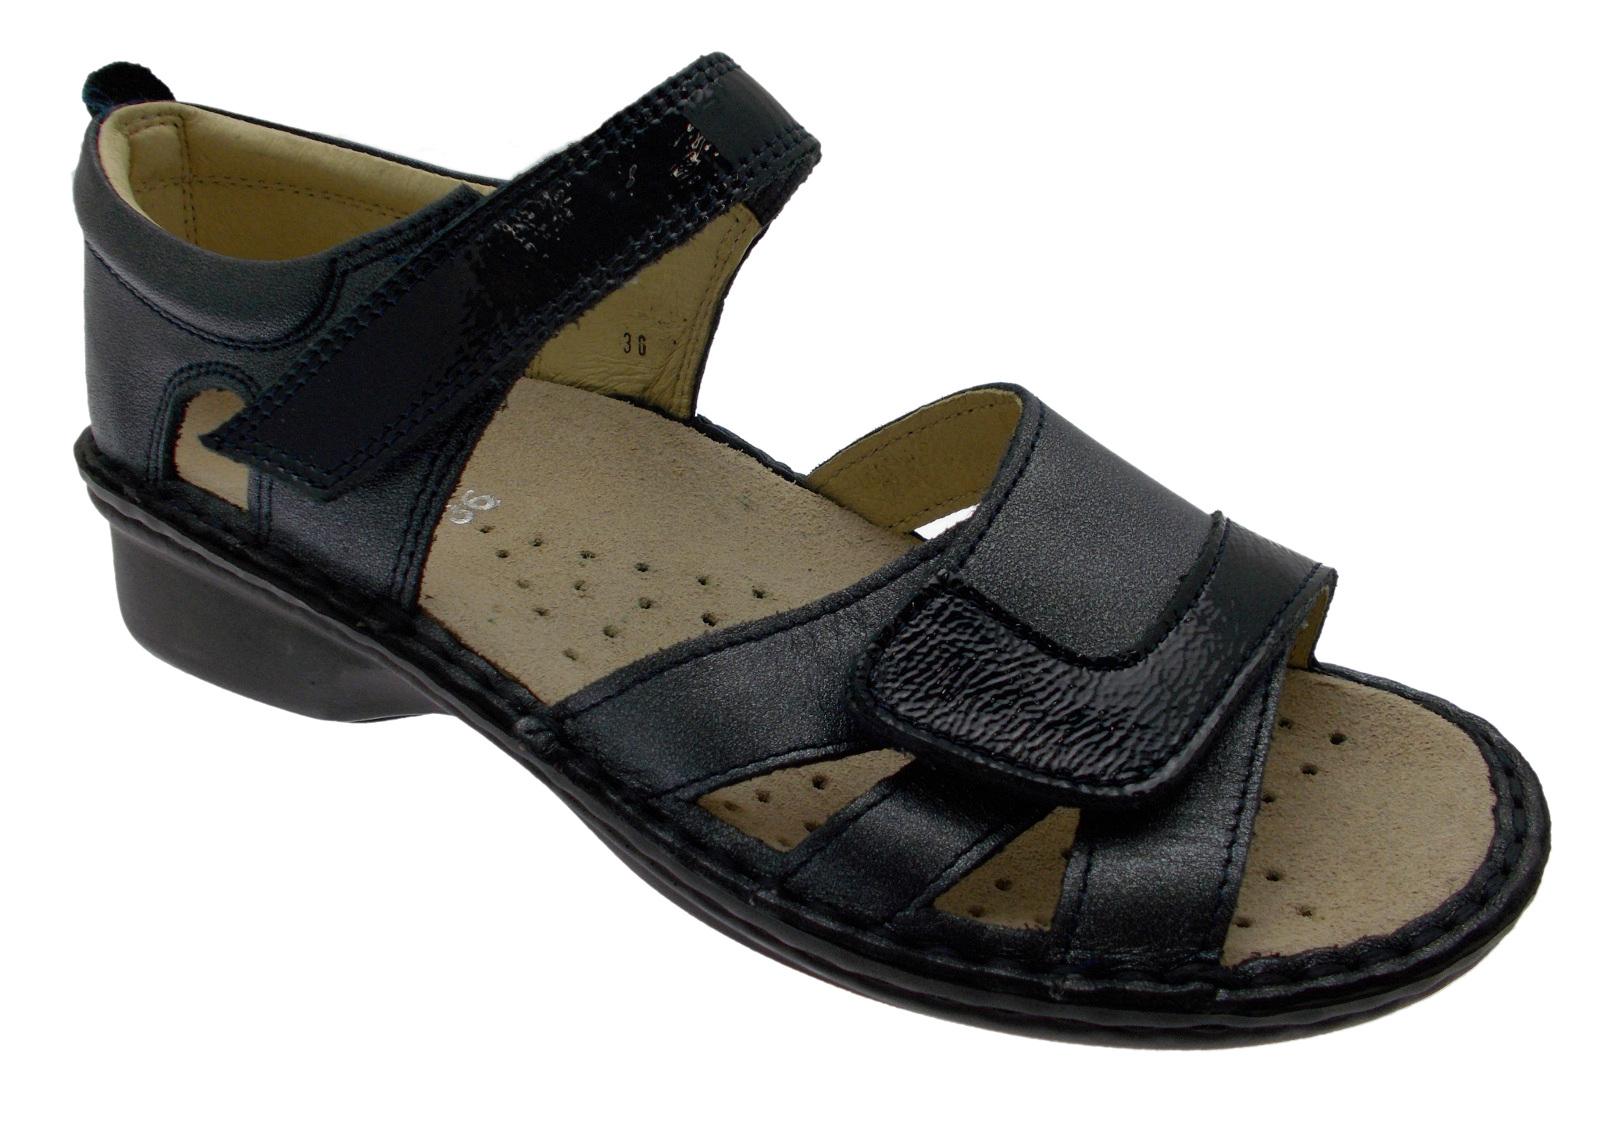 M2524 scarpa ortopedico sandalo blue extra large ortopedico scarpa regolabile Loren 549541